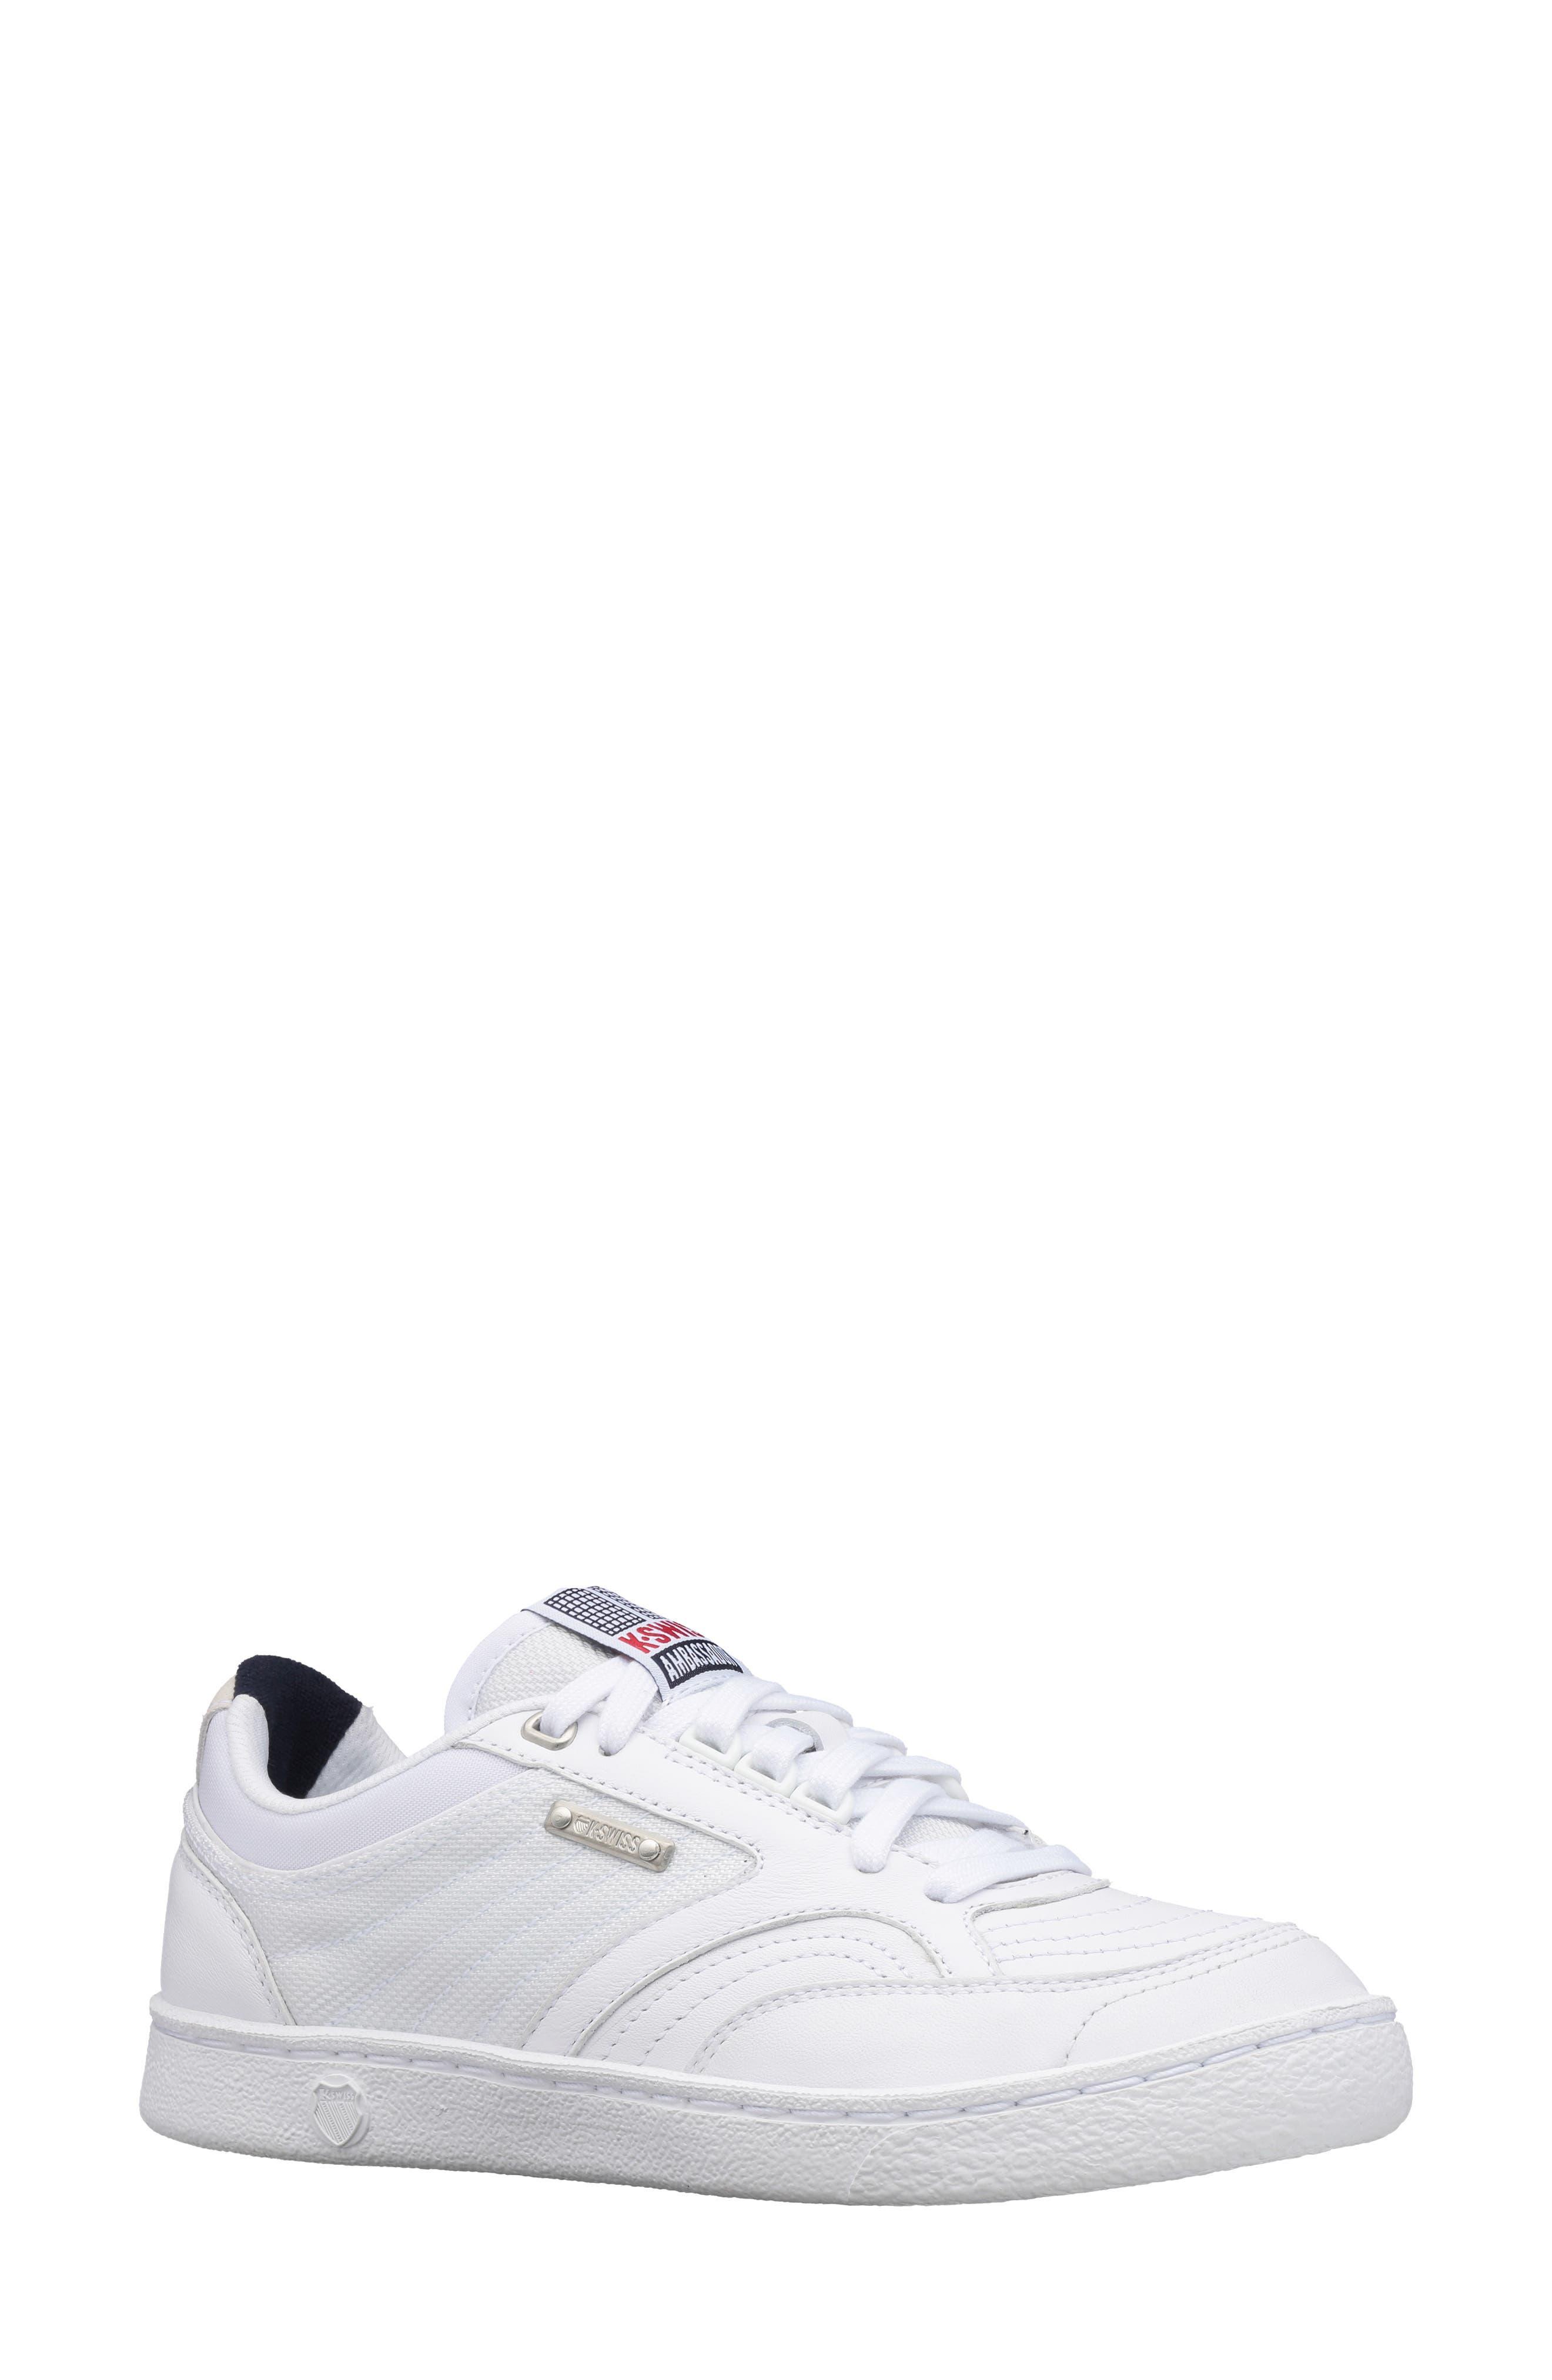 Ambassador Elite Tennis Sneaker